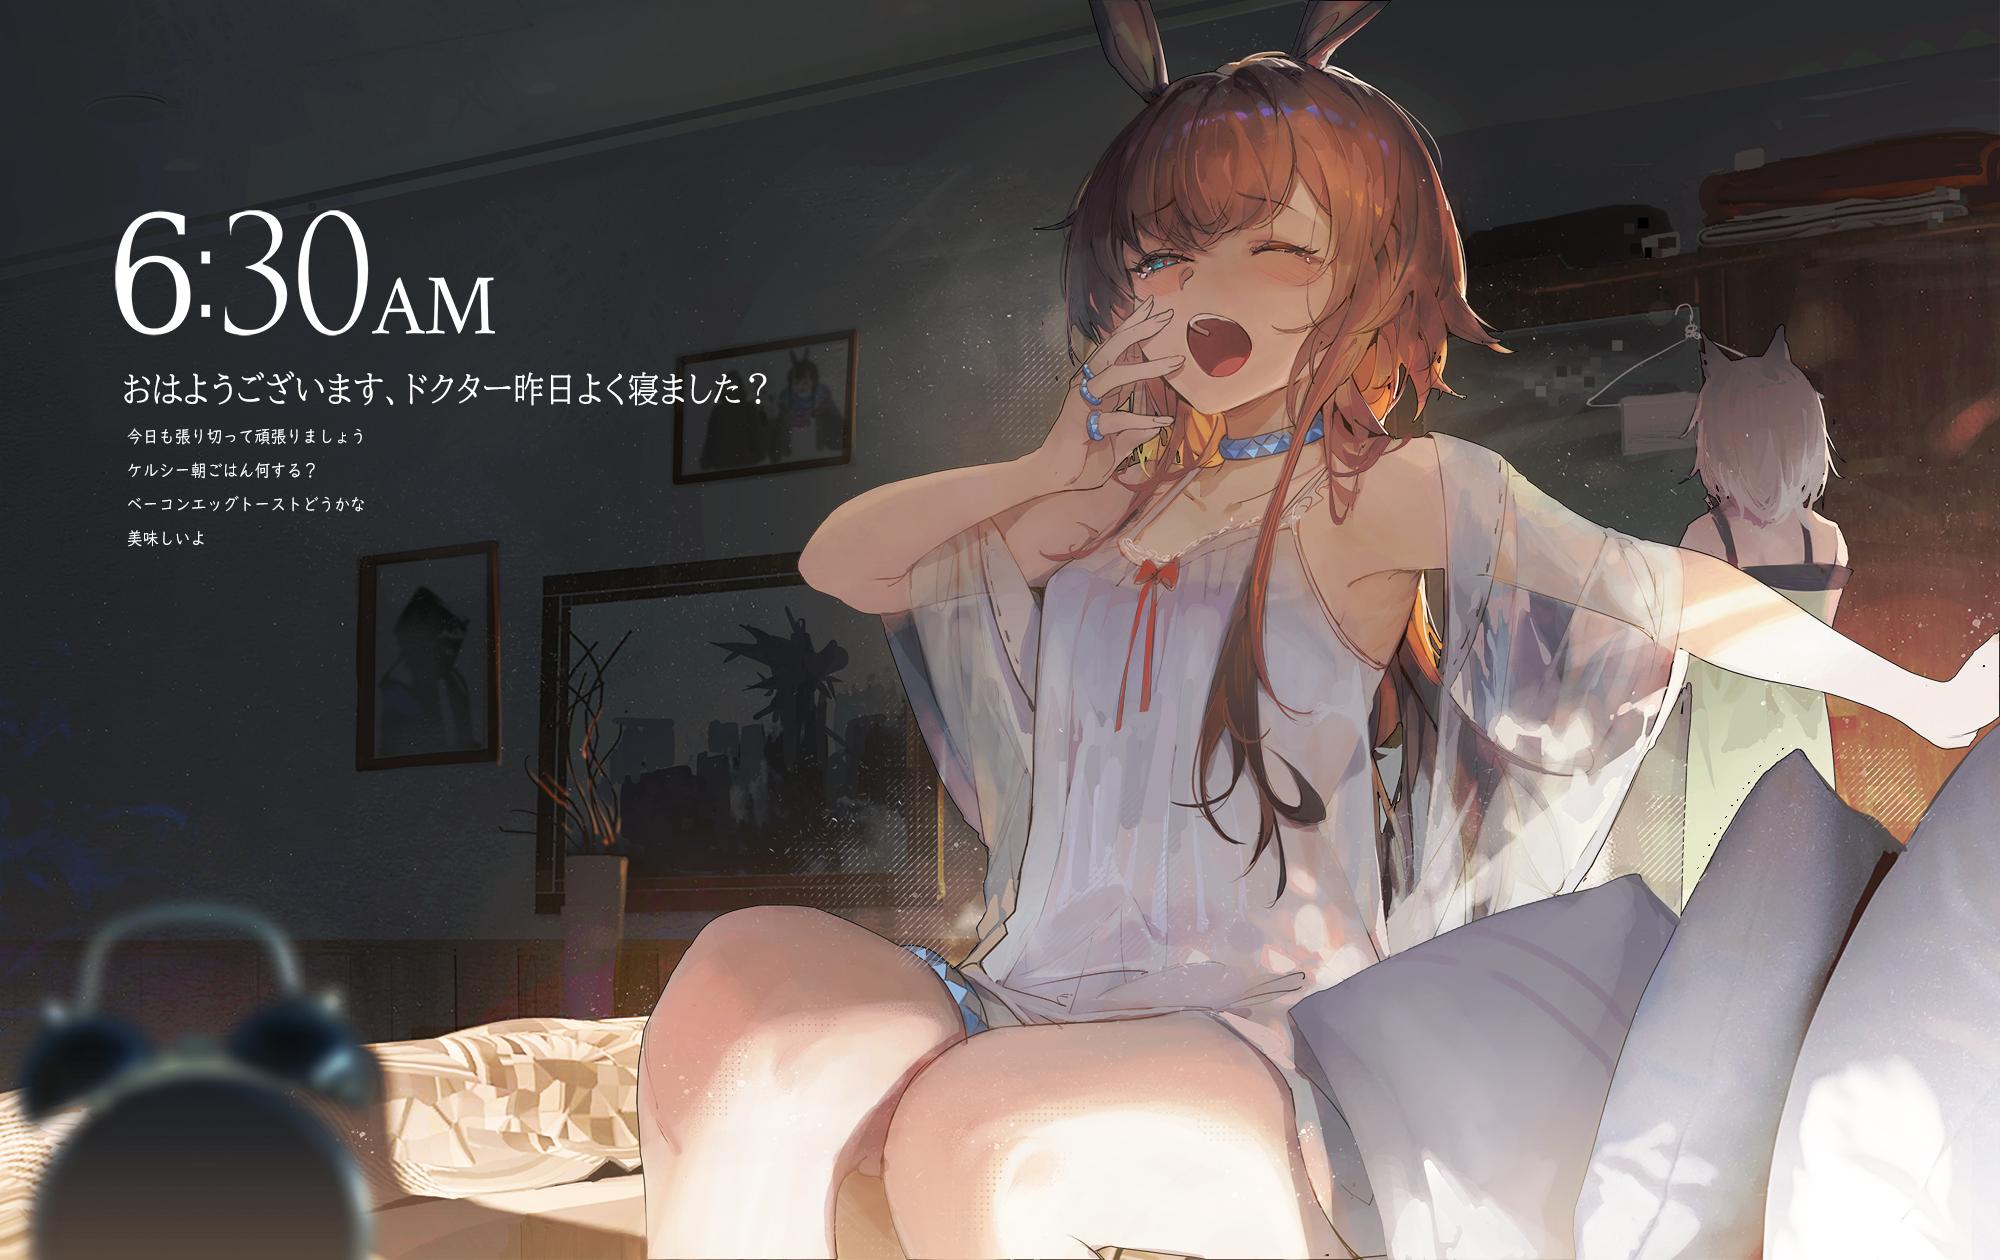 Anime 2000x1260 Arknights Kuroduki anime anime girls Amiya (Arknights)